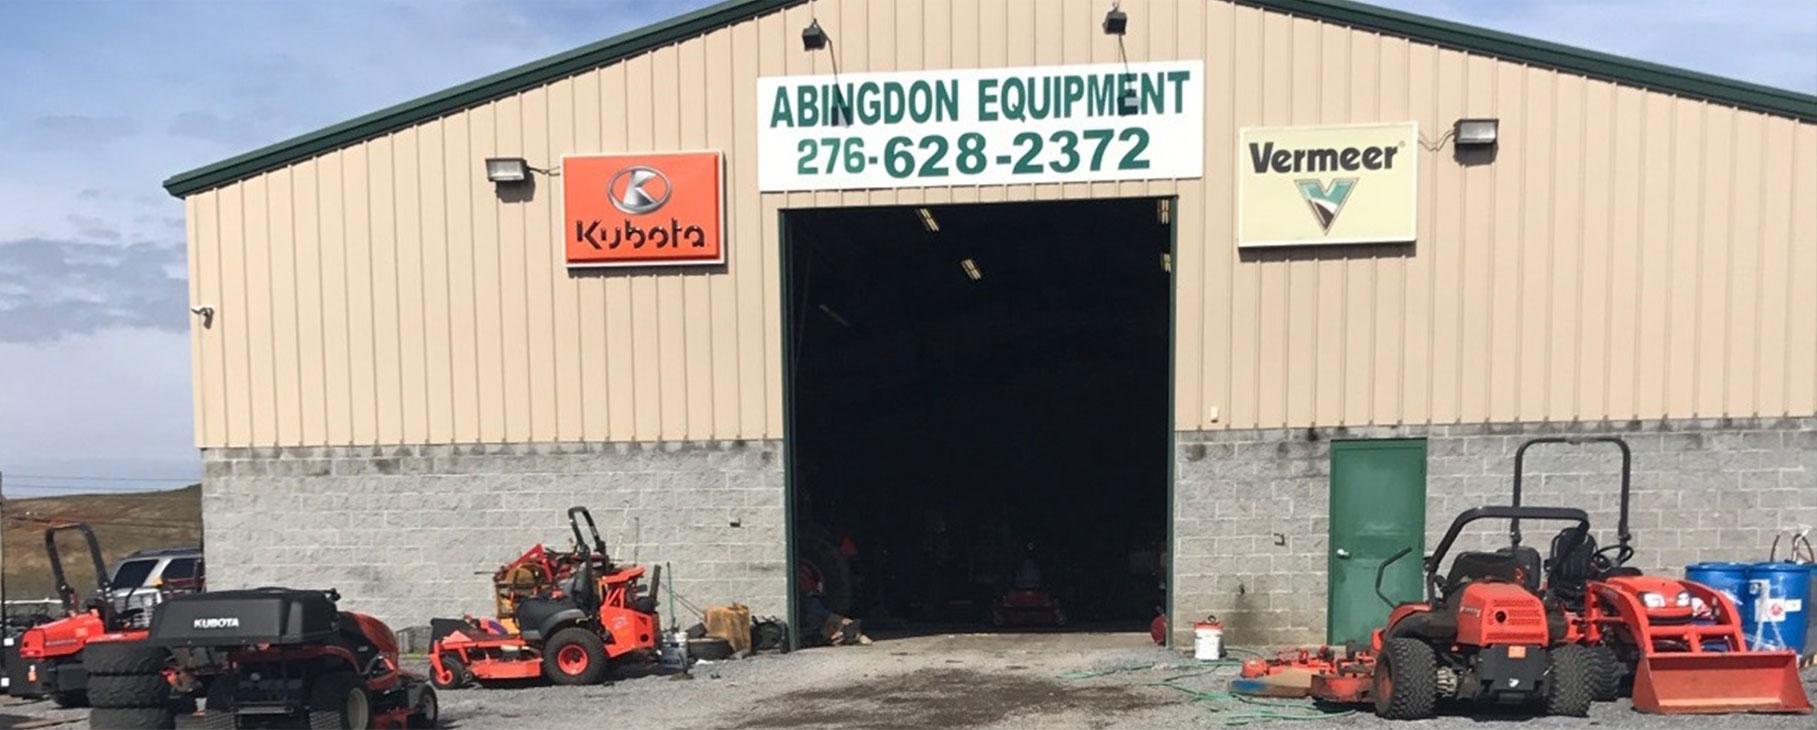 Abingdon Equipment Co